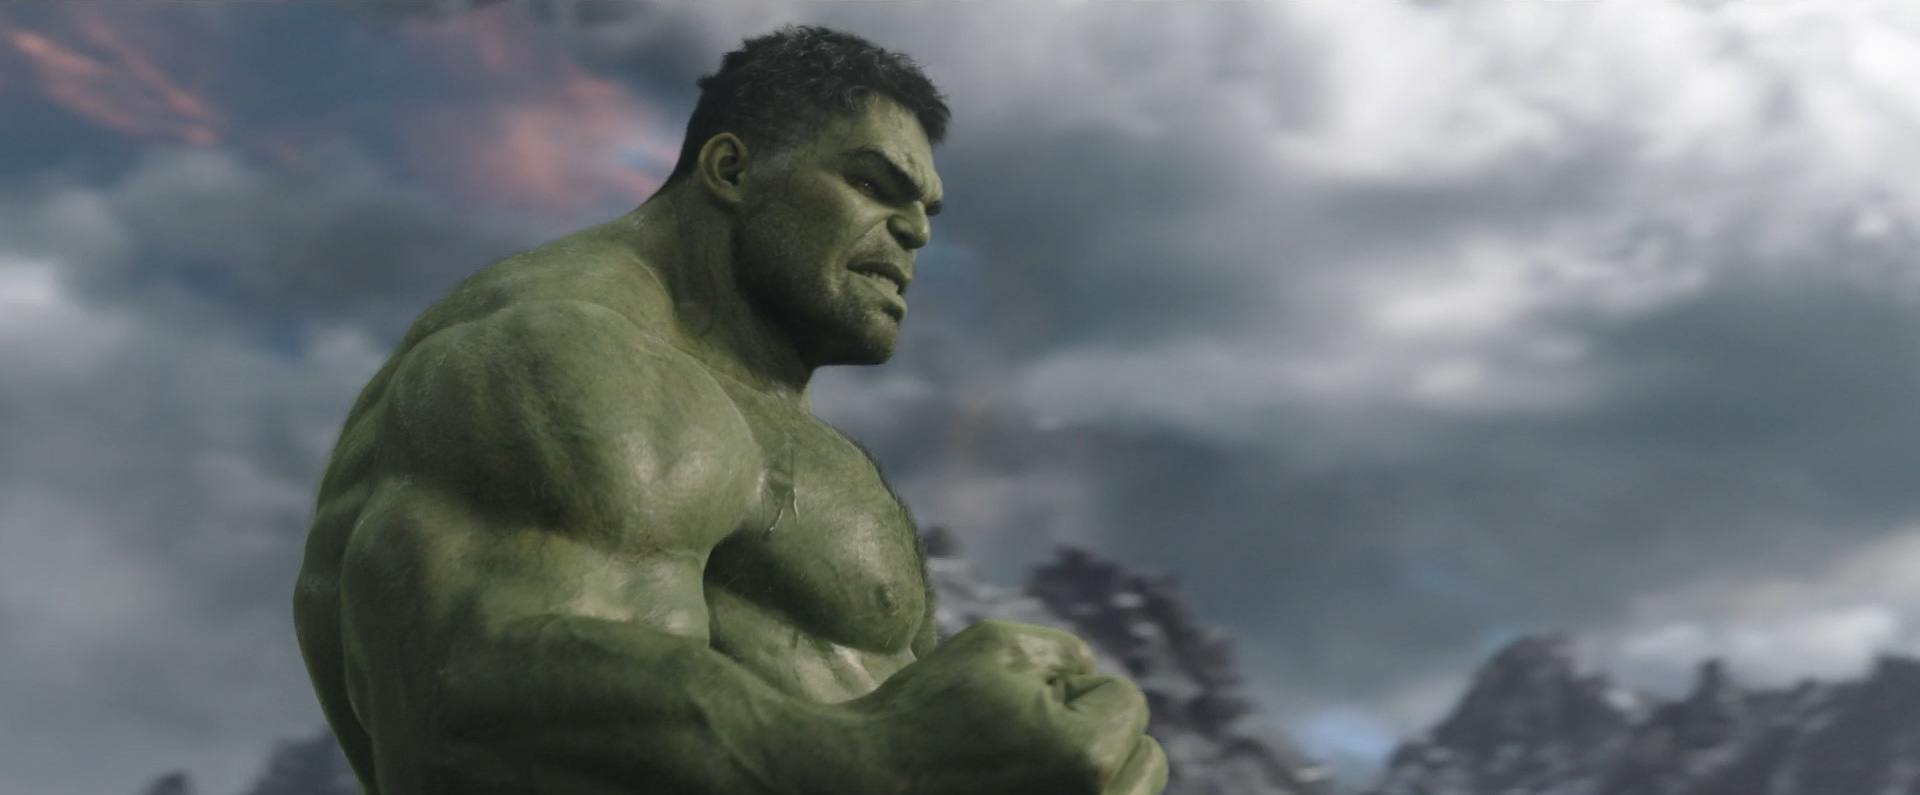 Screenshots Of Hulk Surtur Hela Amp More From Thor